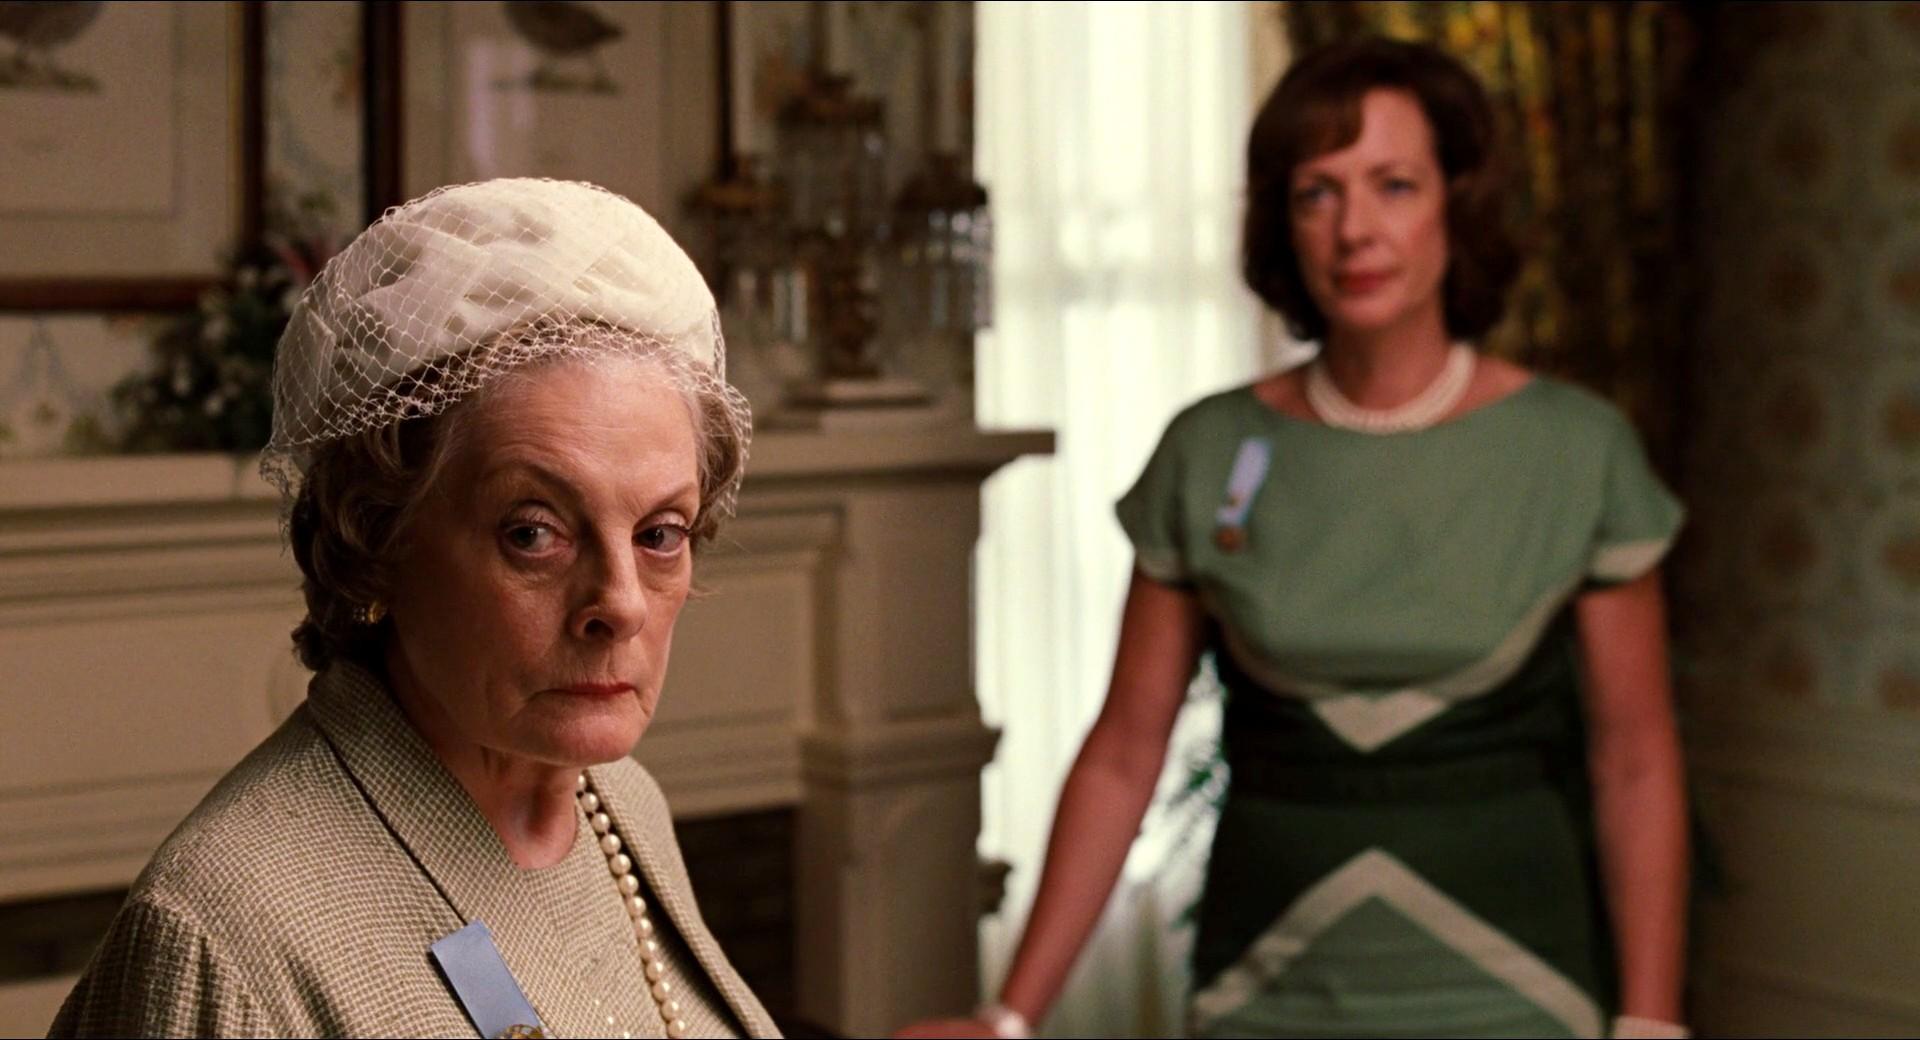 Lois Moran,Maja Salvador (b. 1988) Erotic tube Sheila Mercier (born 1919),Wendy Kaplan